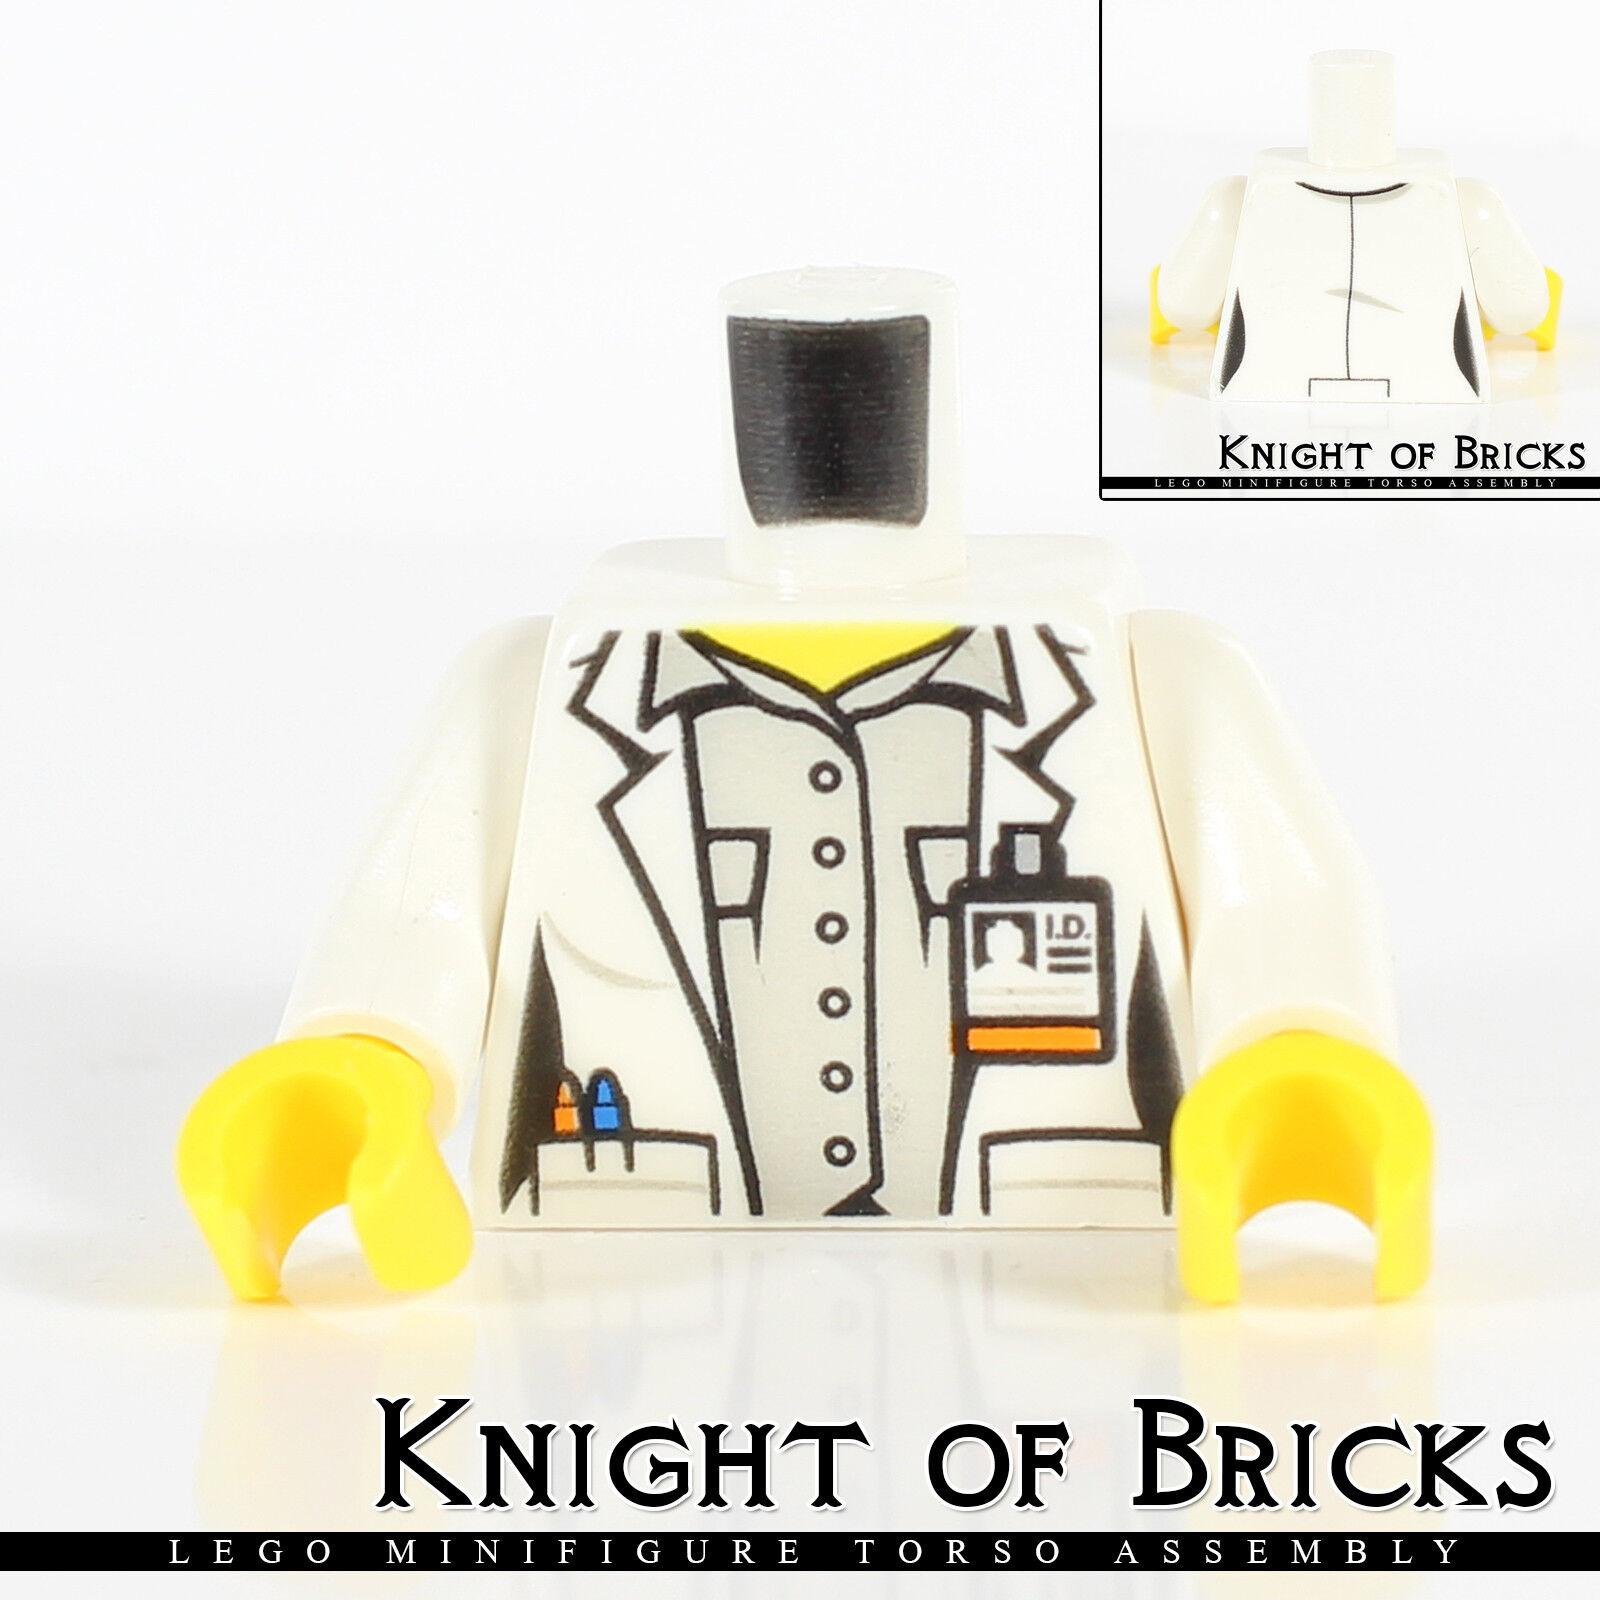 LEGO Minifigure Torso 396 WHITE Female Corset Ribbon Bride City Town Wedding